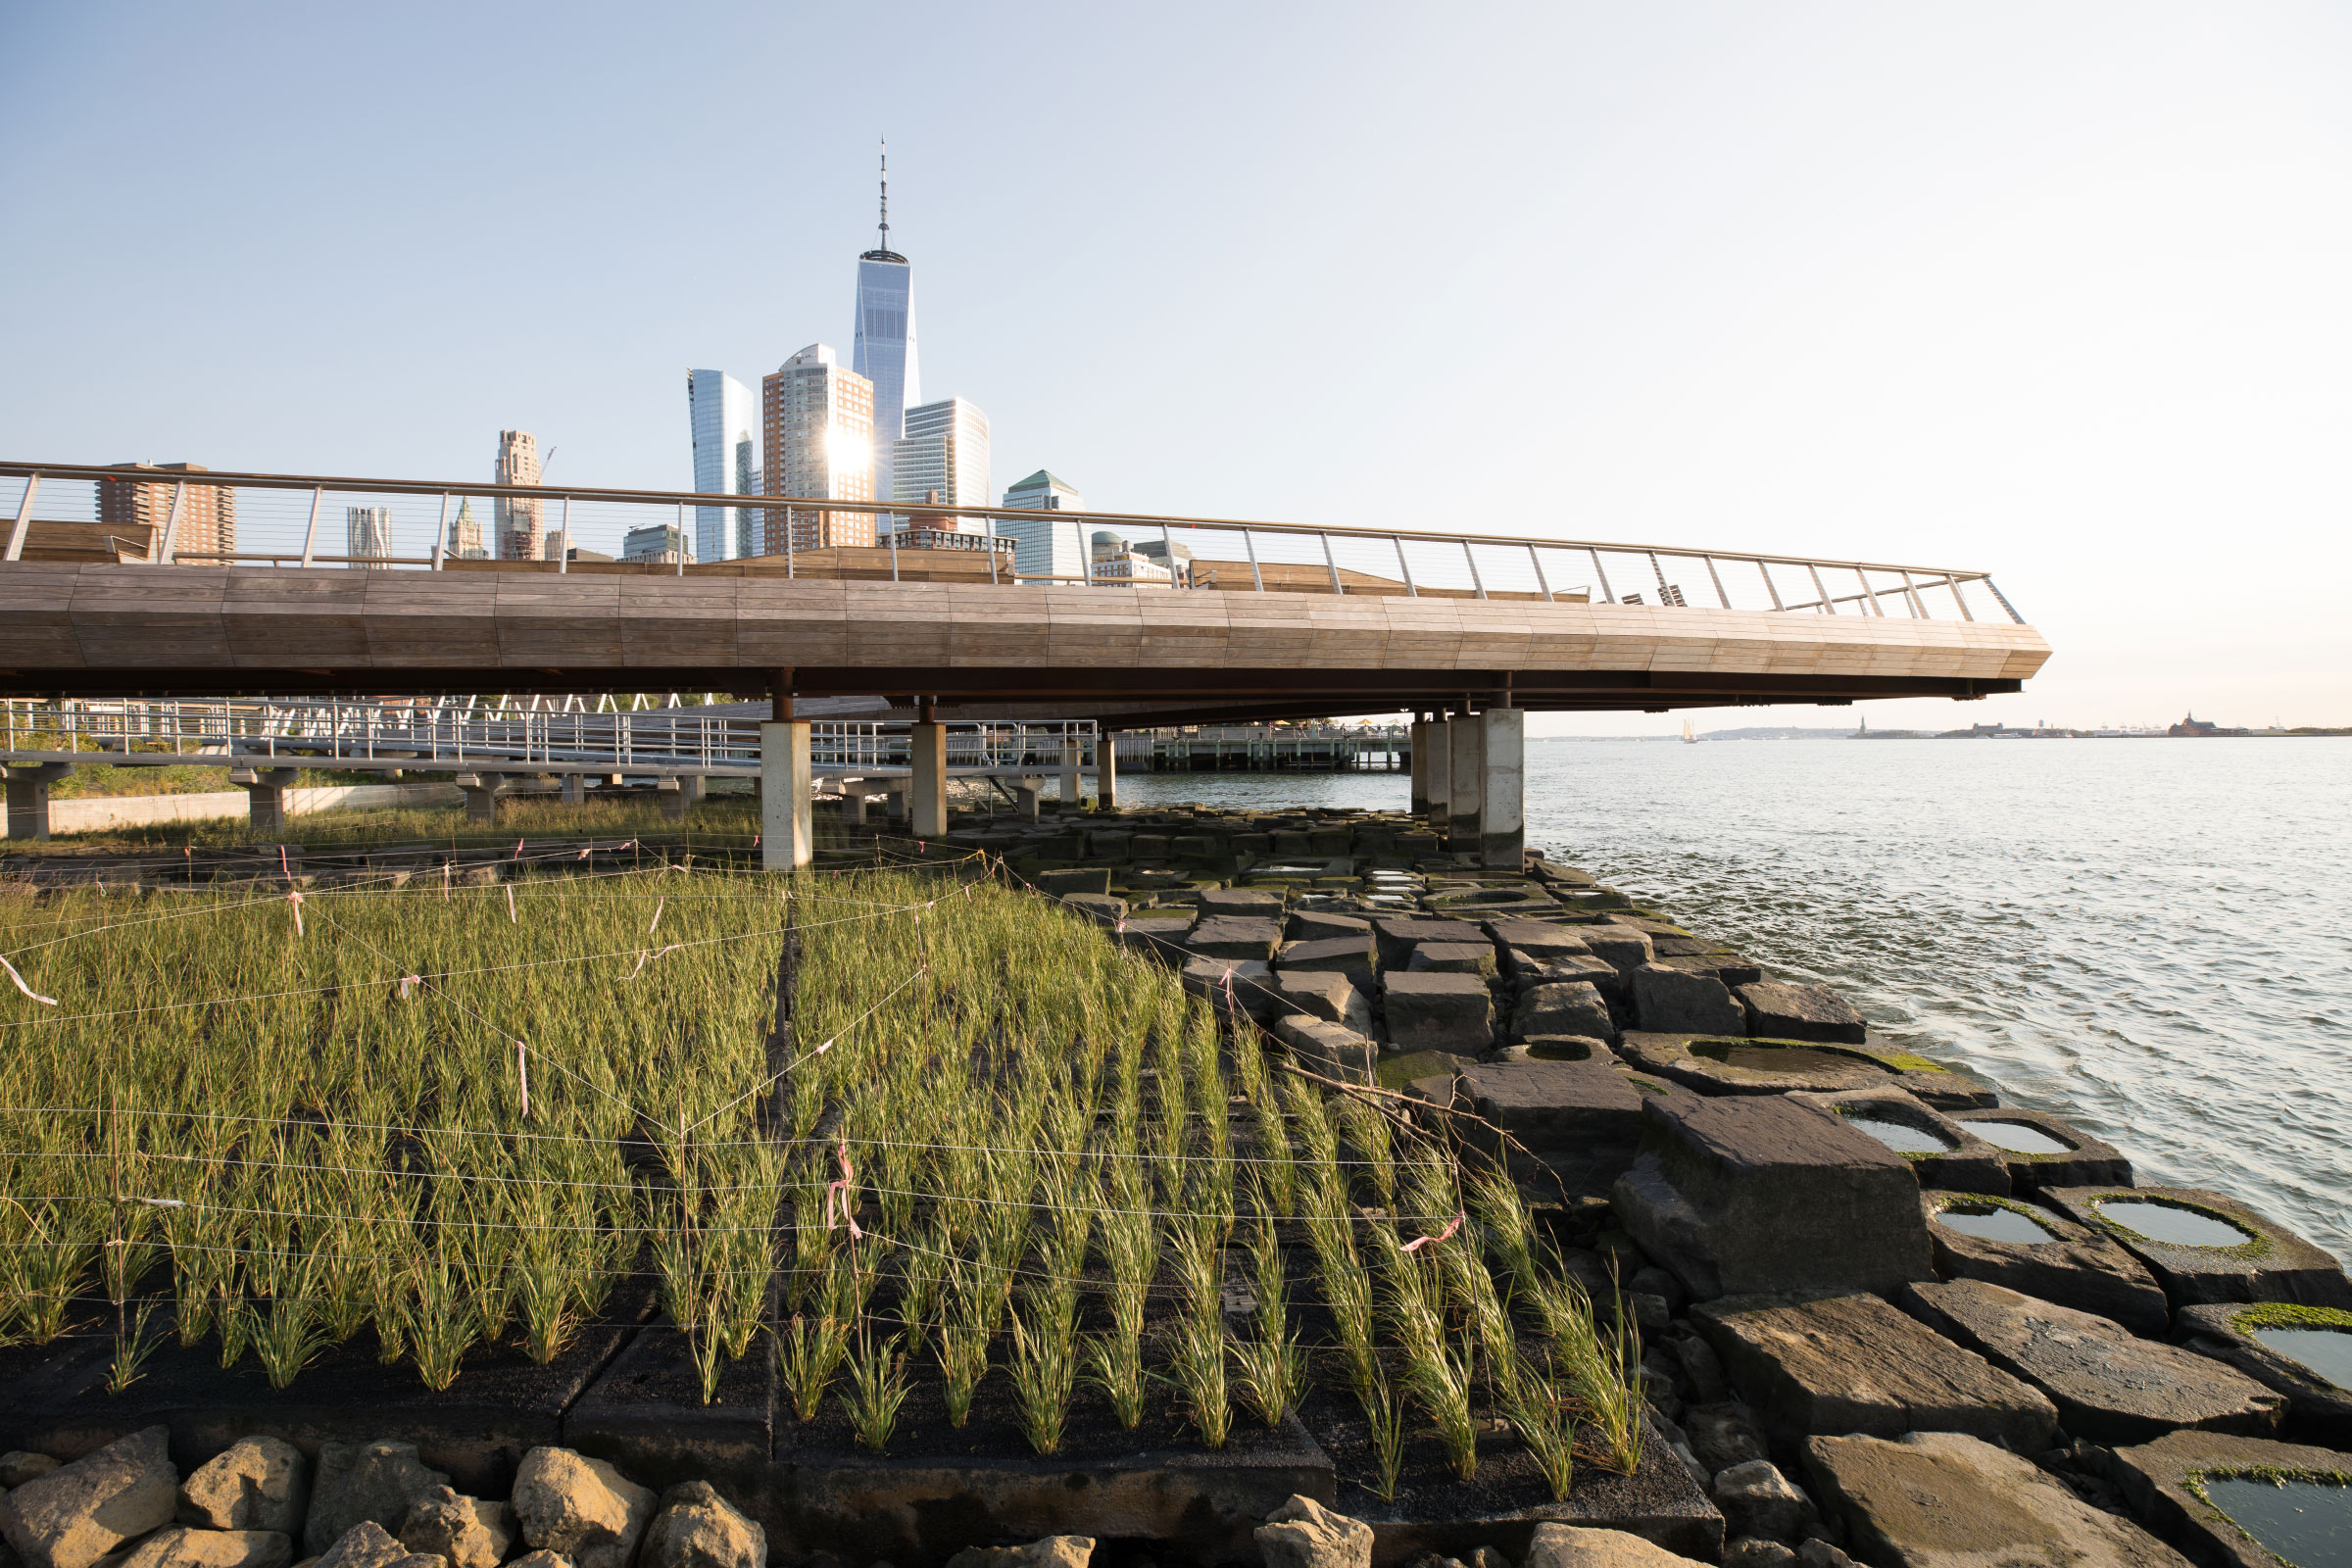 Pier 26 Tide Deck coastal environment at Hudson River Park